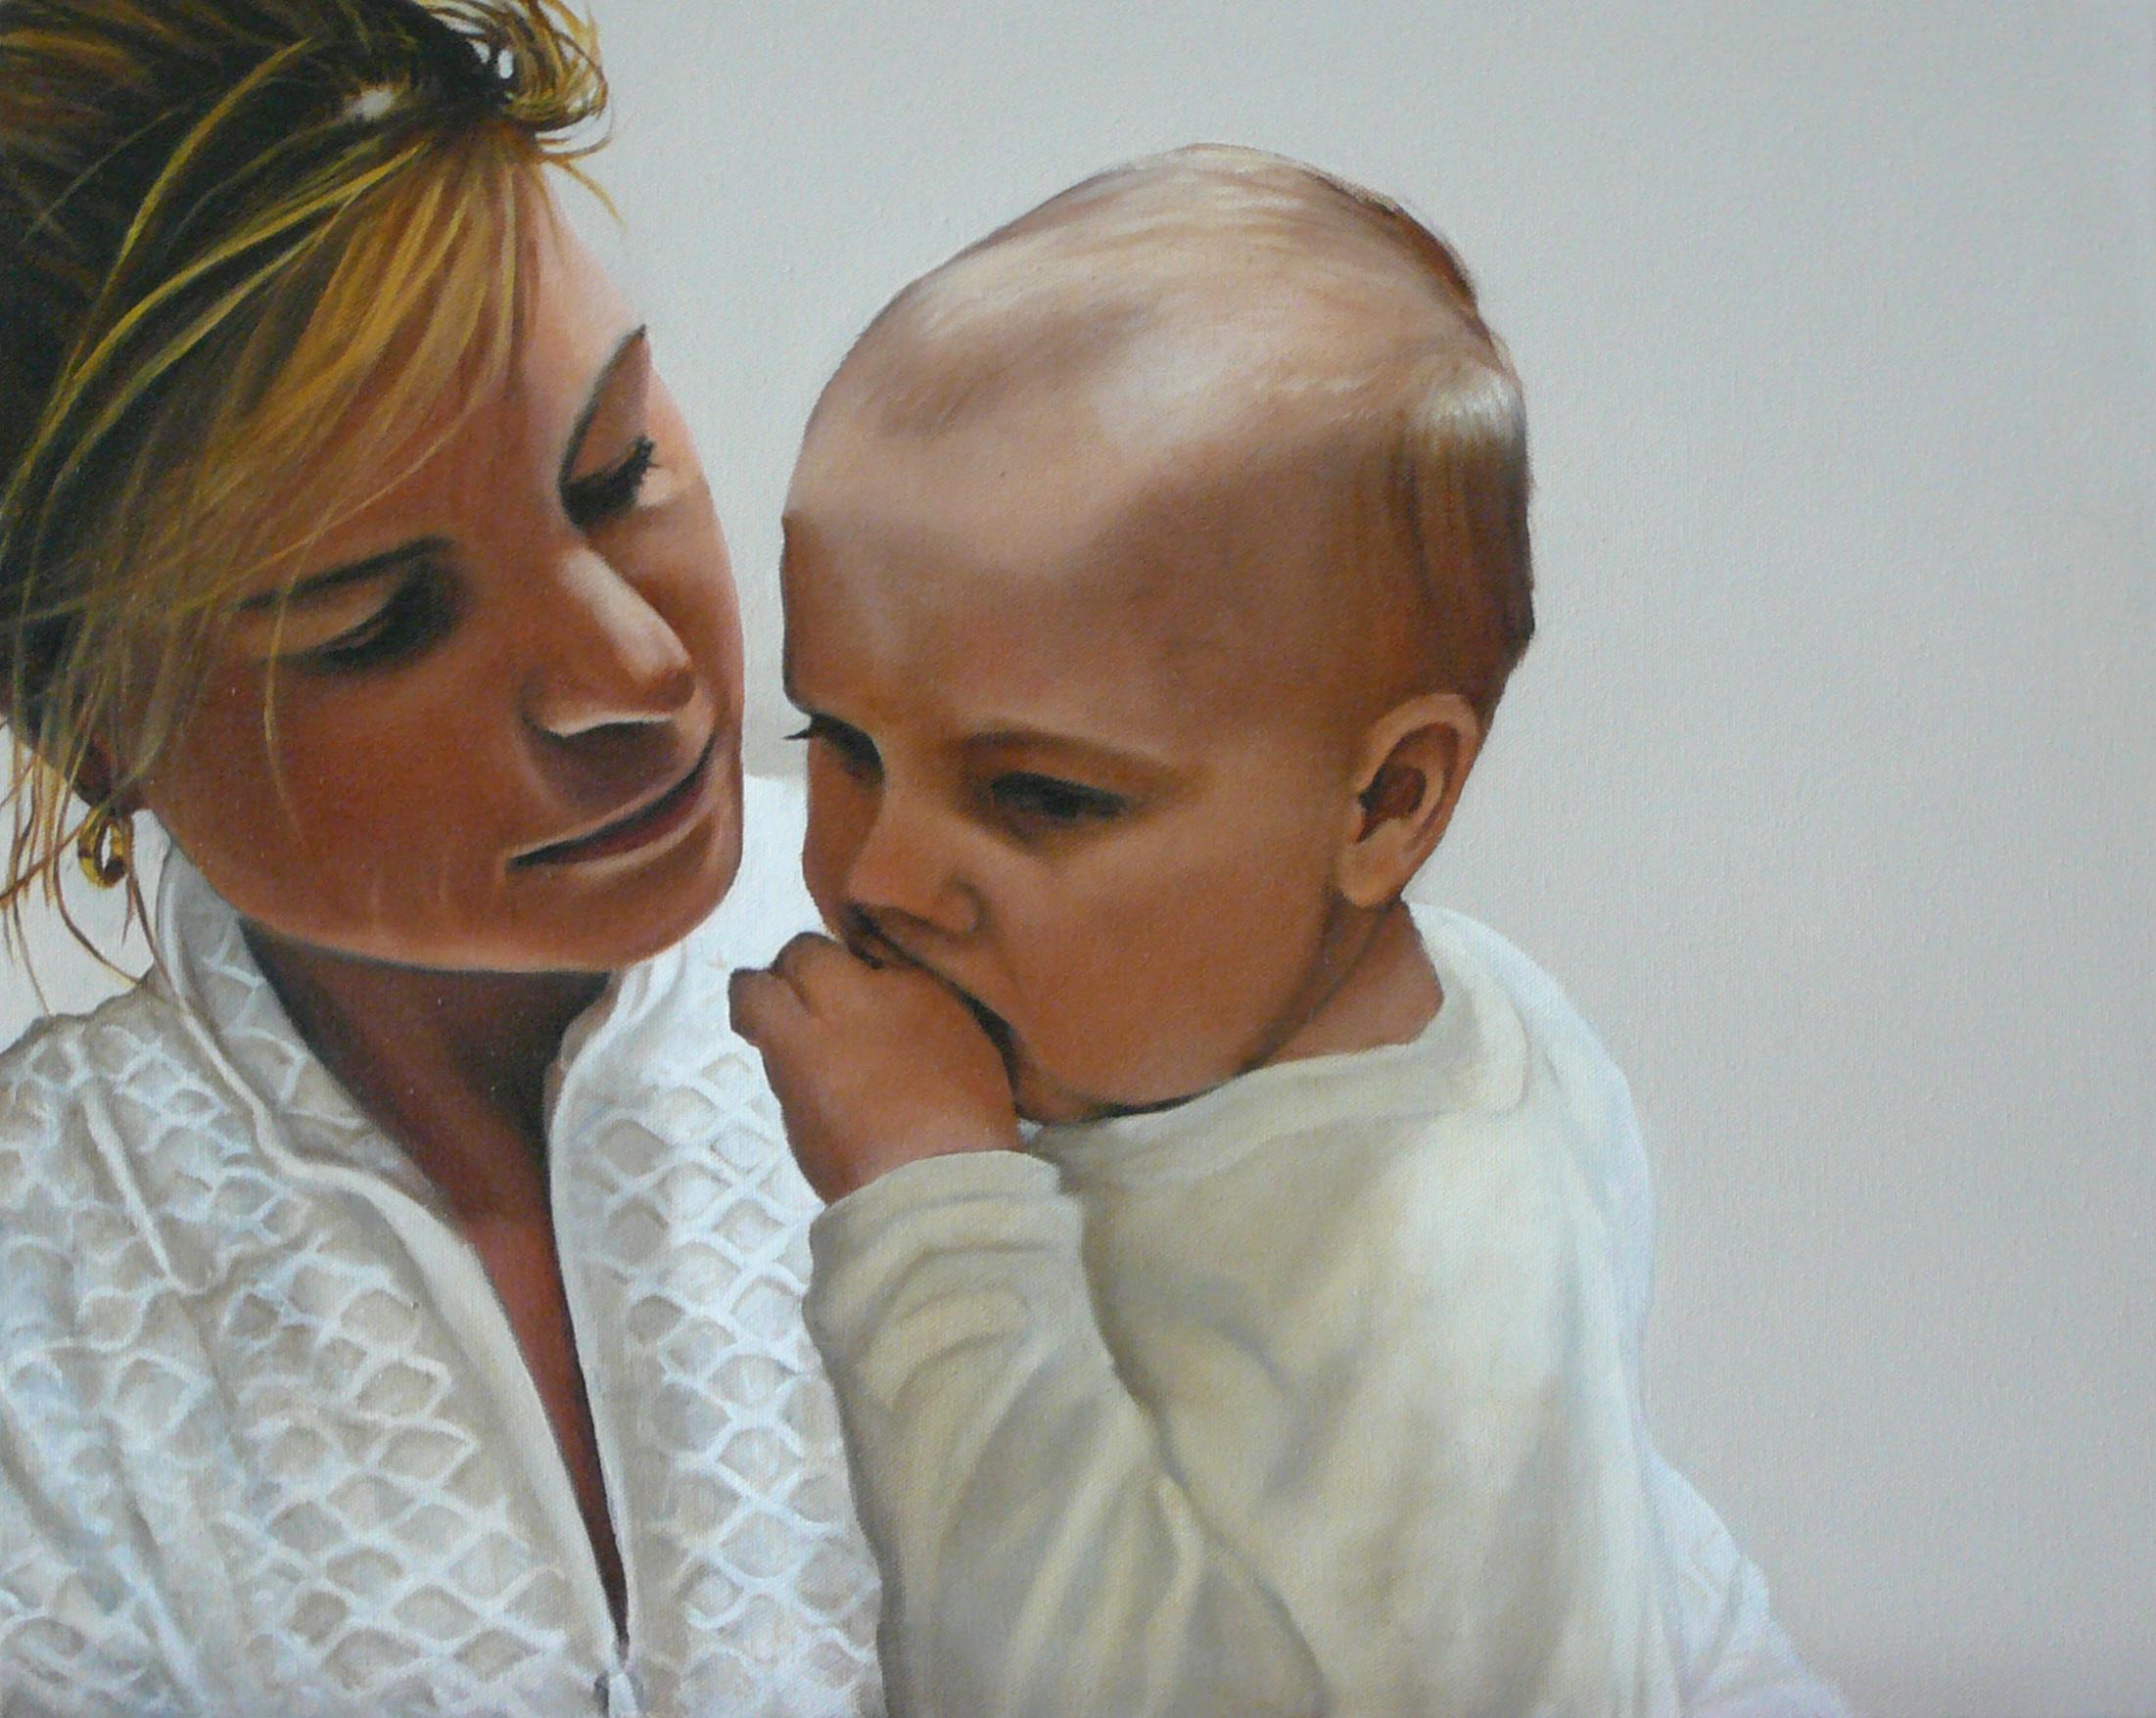 Carmel and baby Jaden